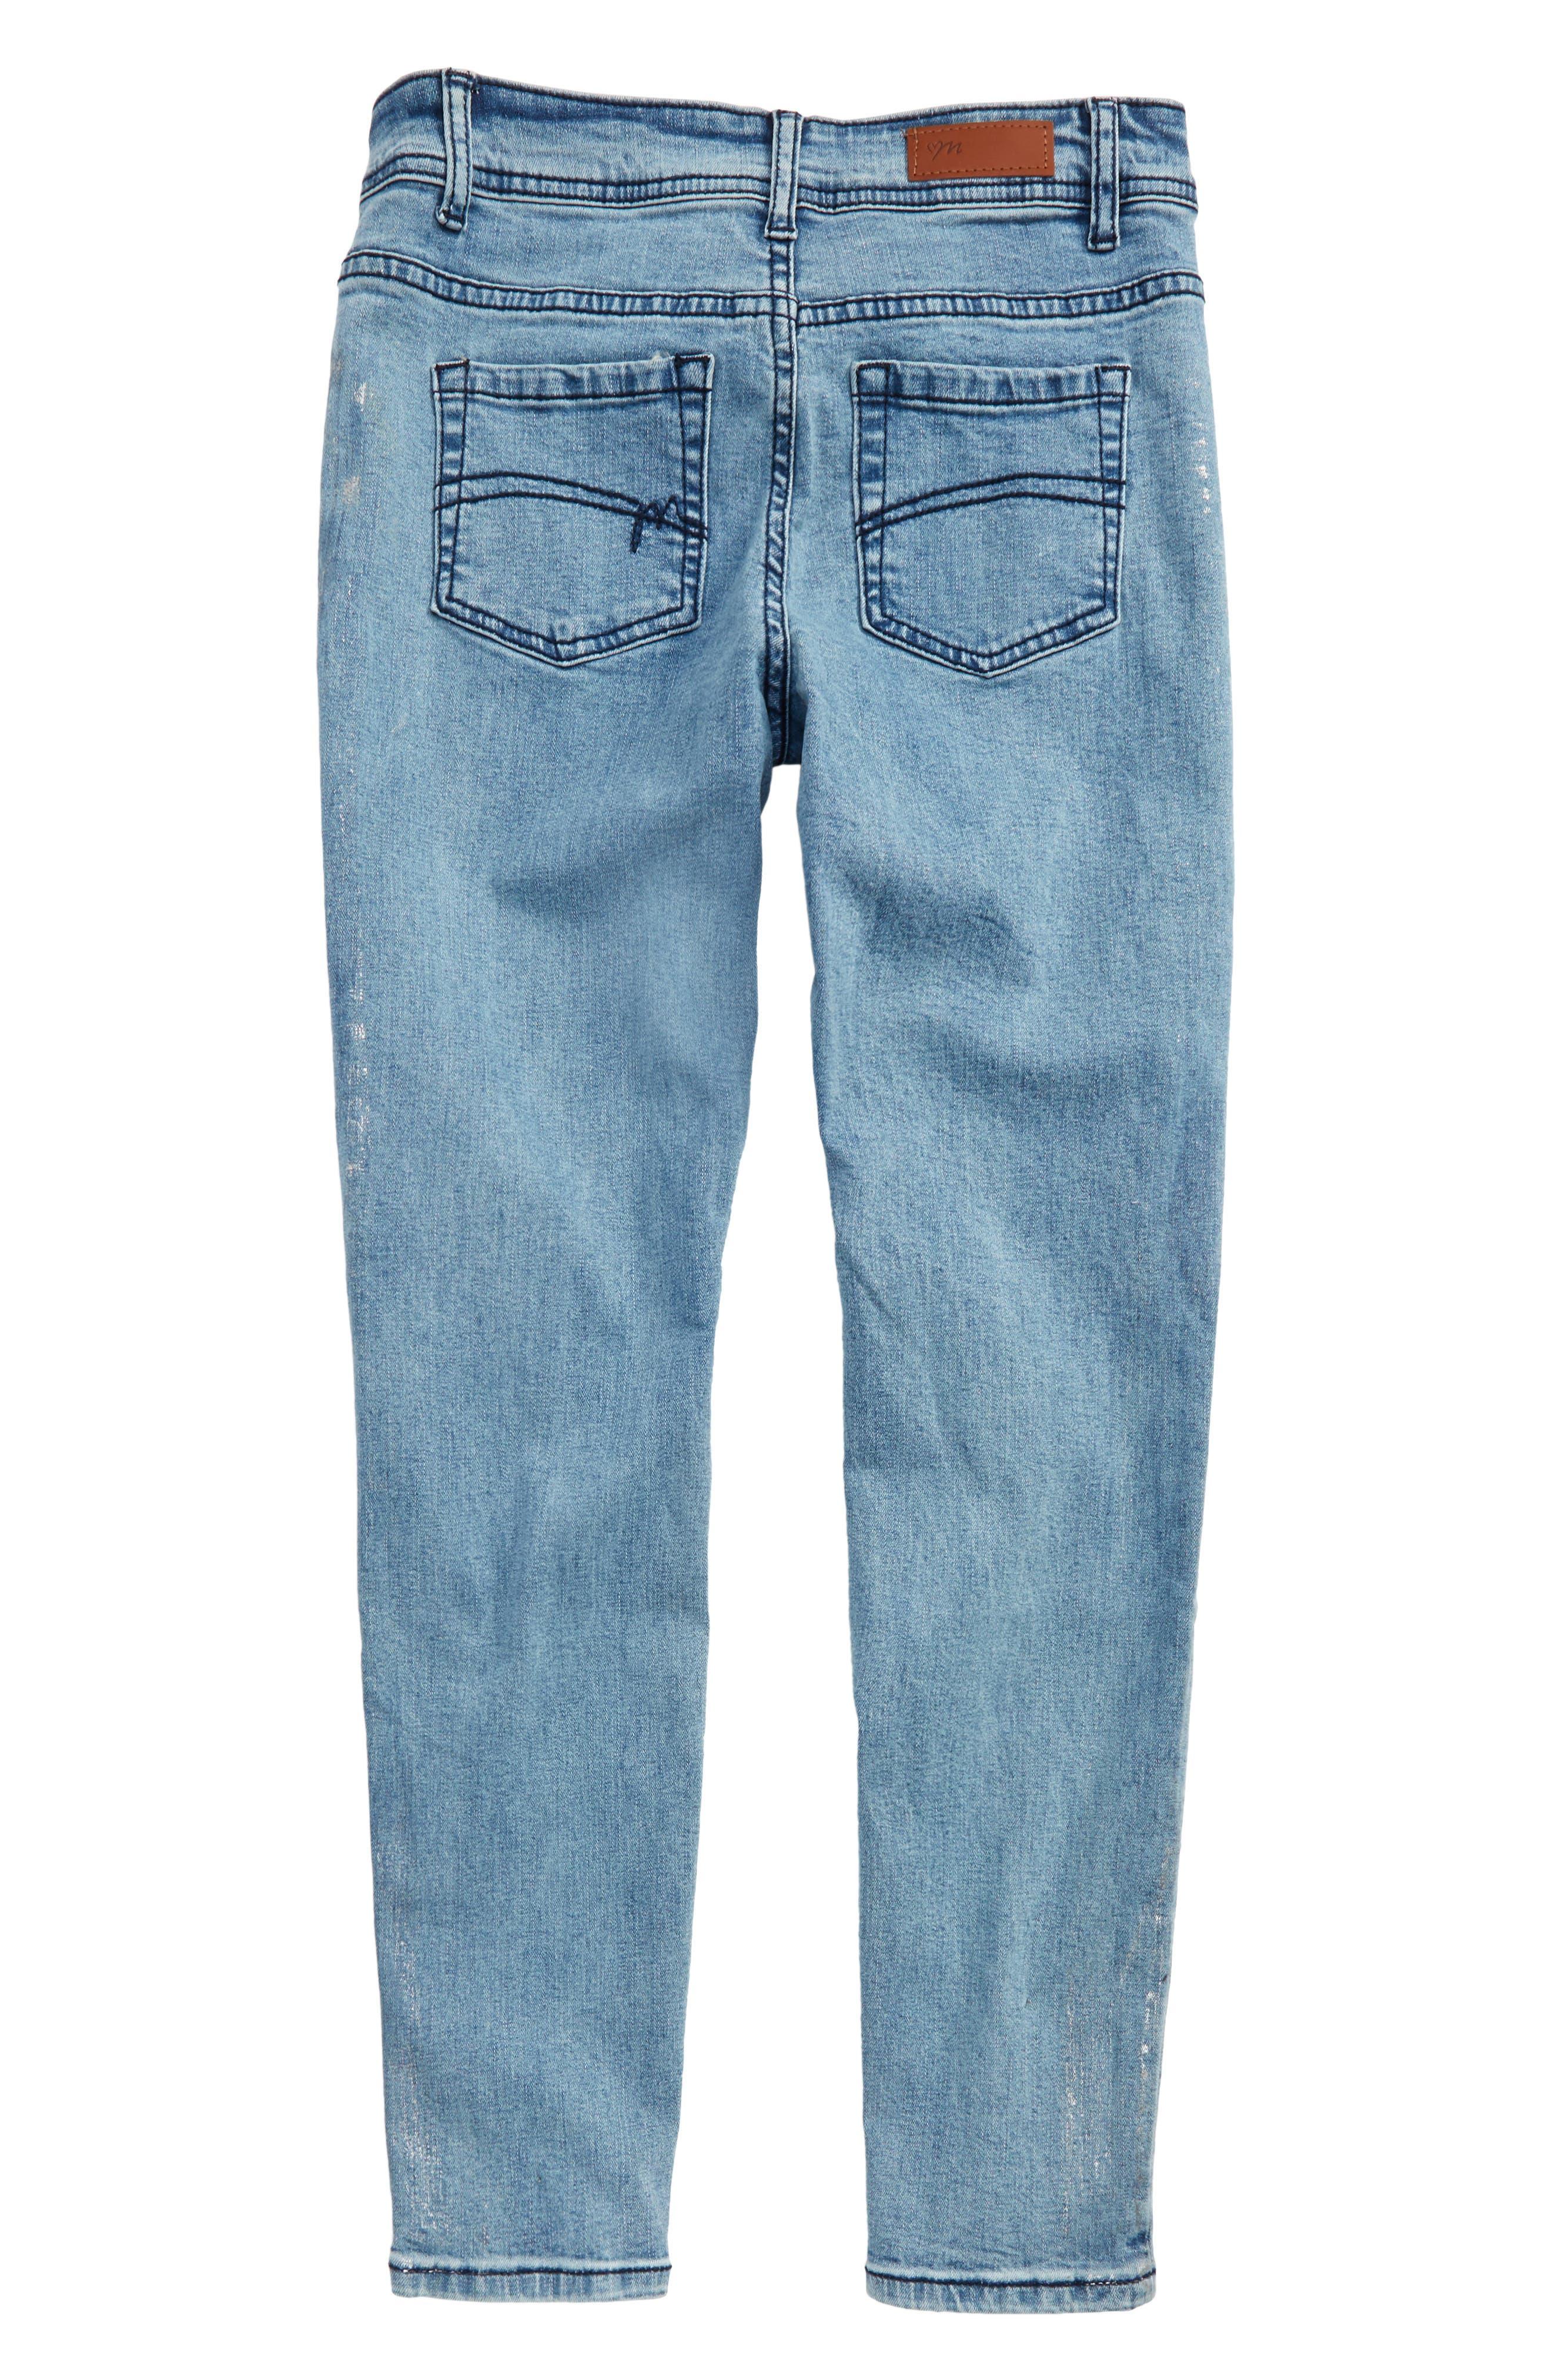 Distressed Skinny Jeans,                             Alternate thumbnail 2, color,                             Denim